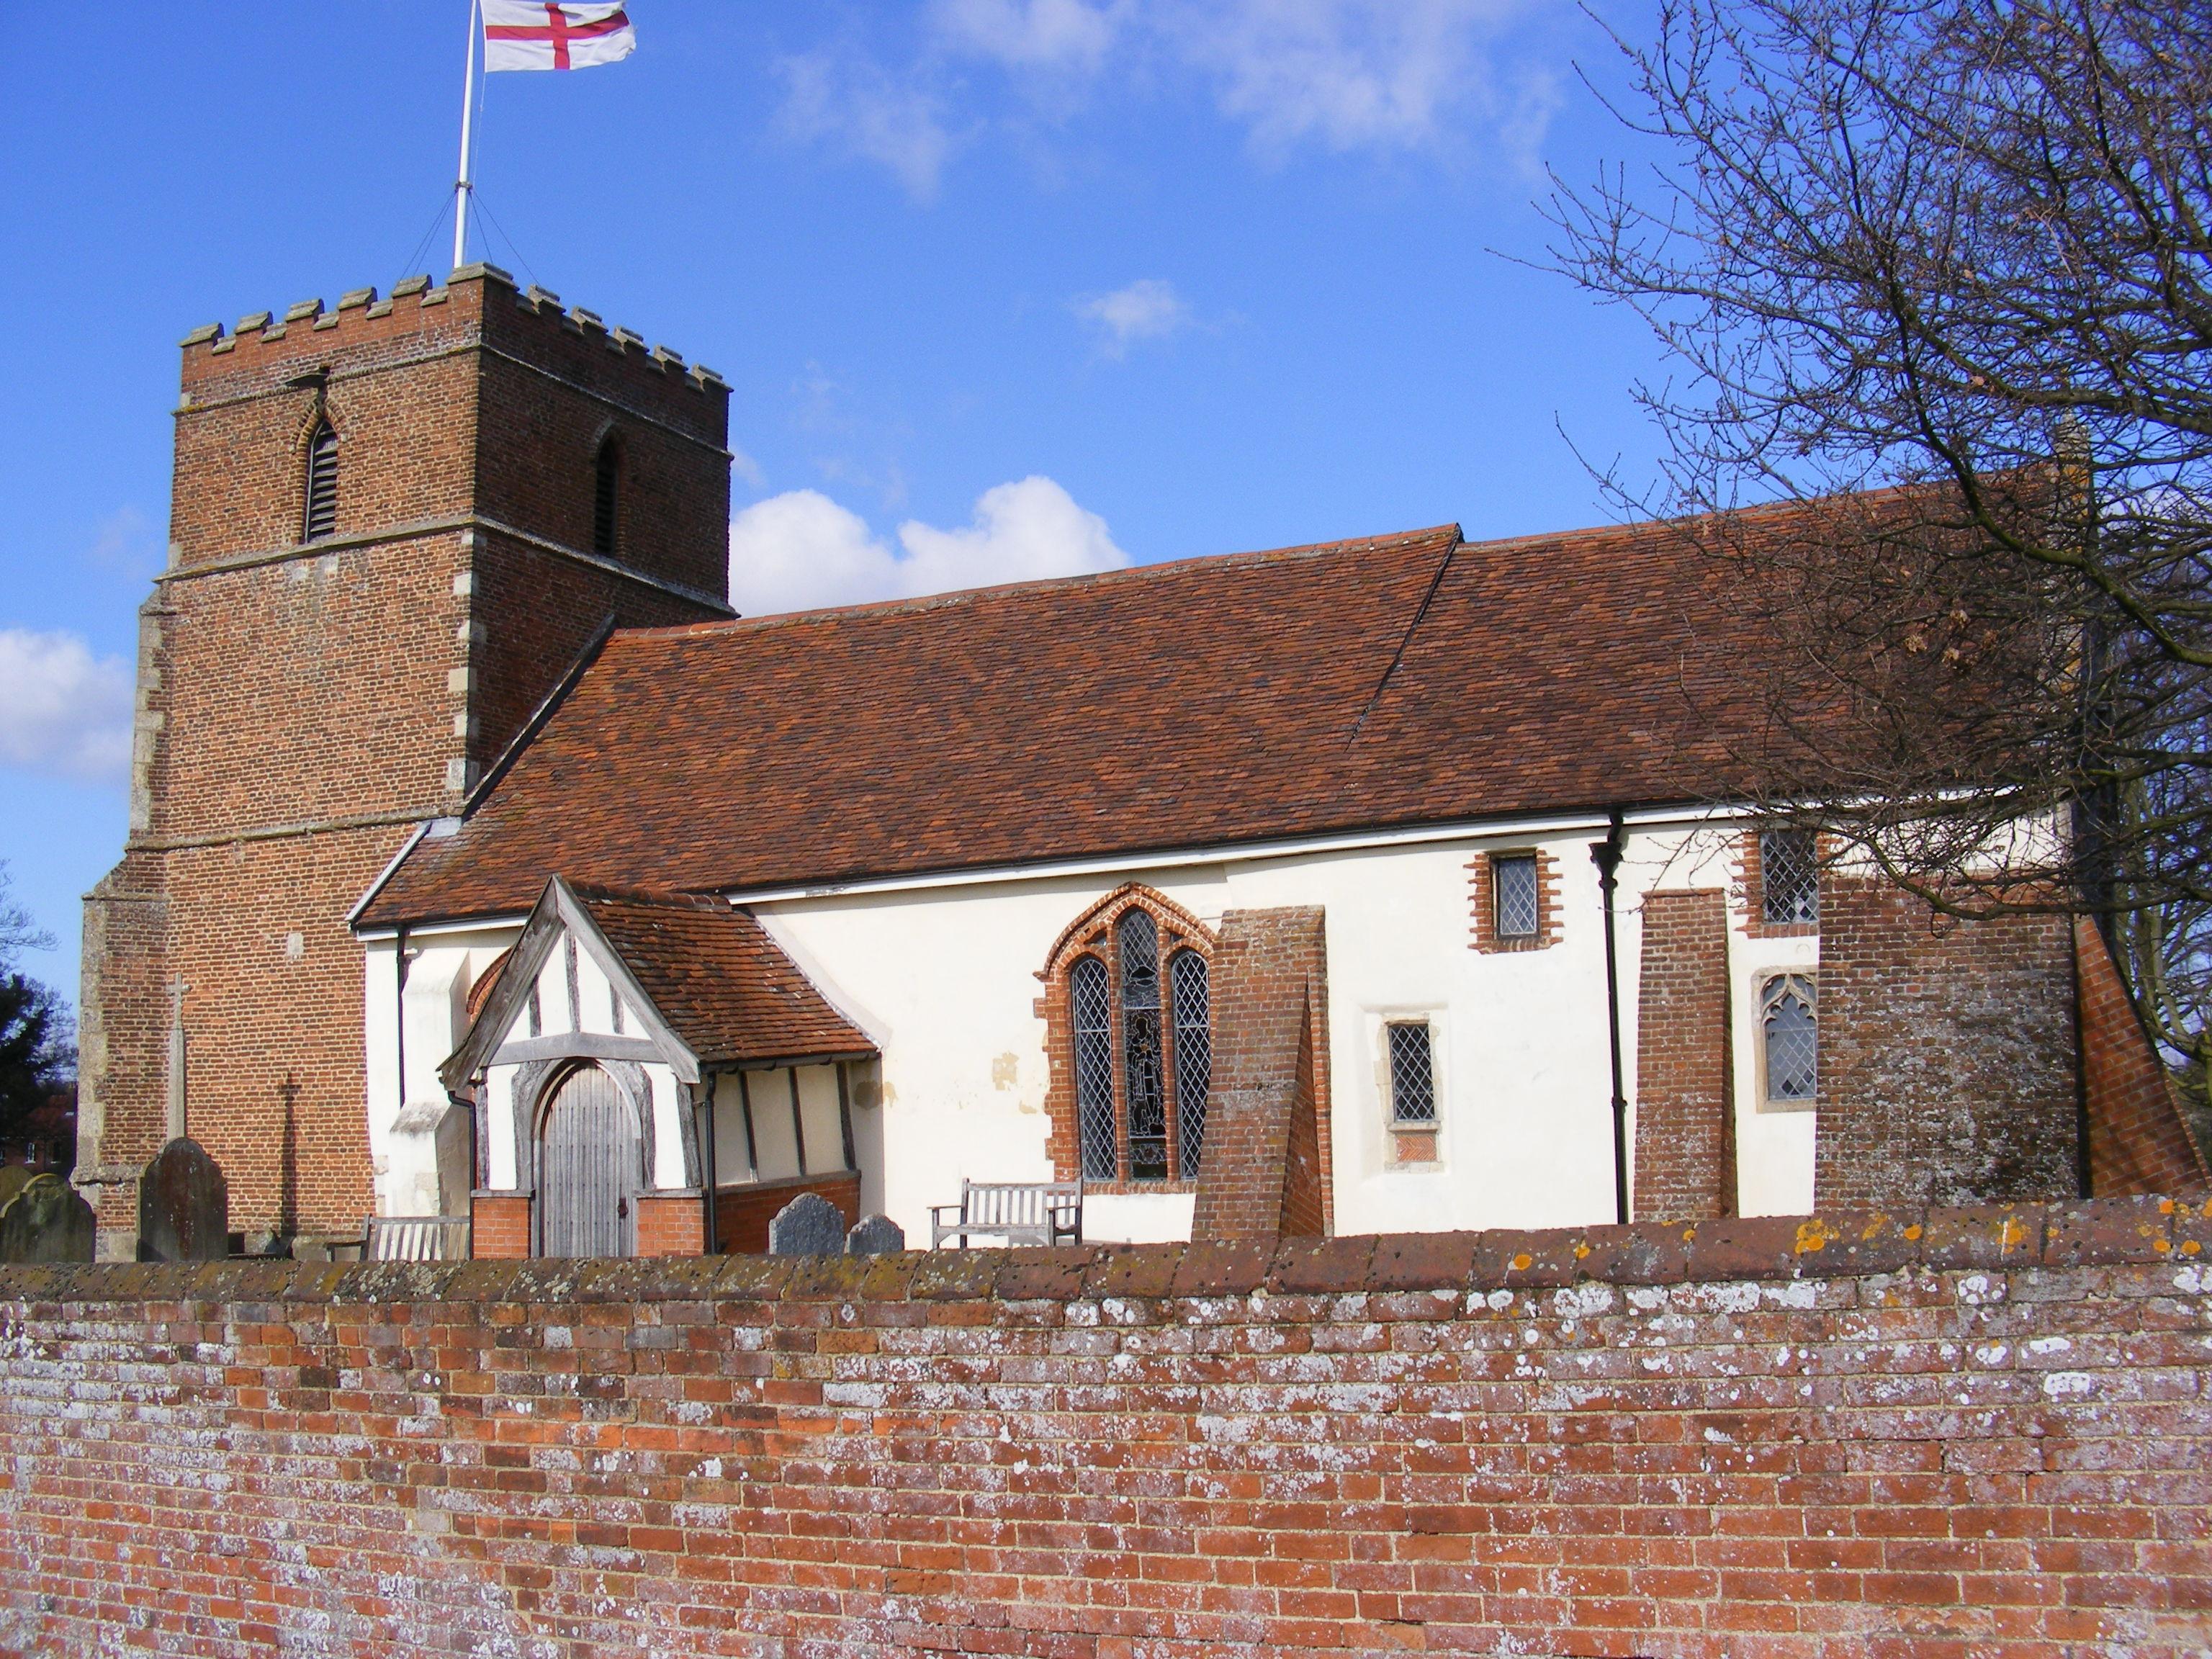 File:St.Peter\'s Church, Levington - geograph.org.uk - 1188051.jpg ...